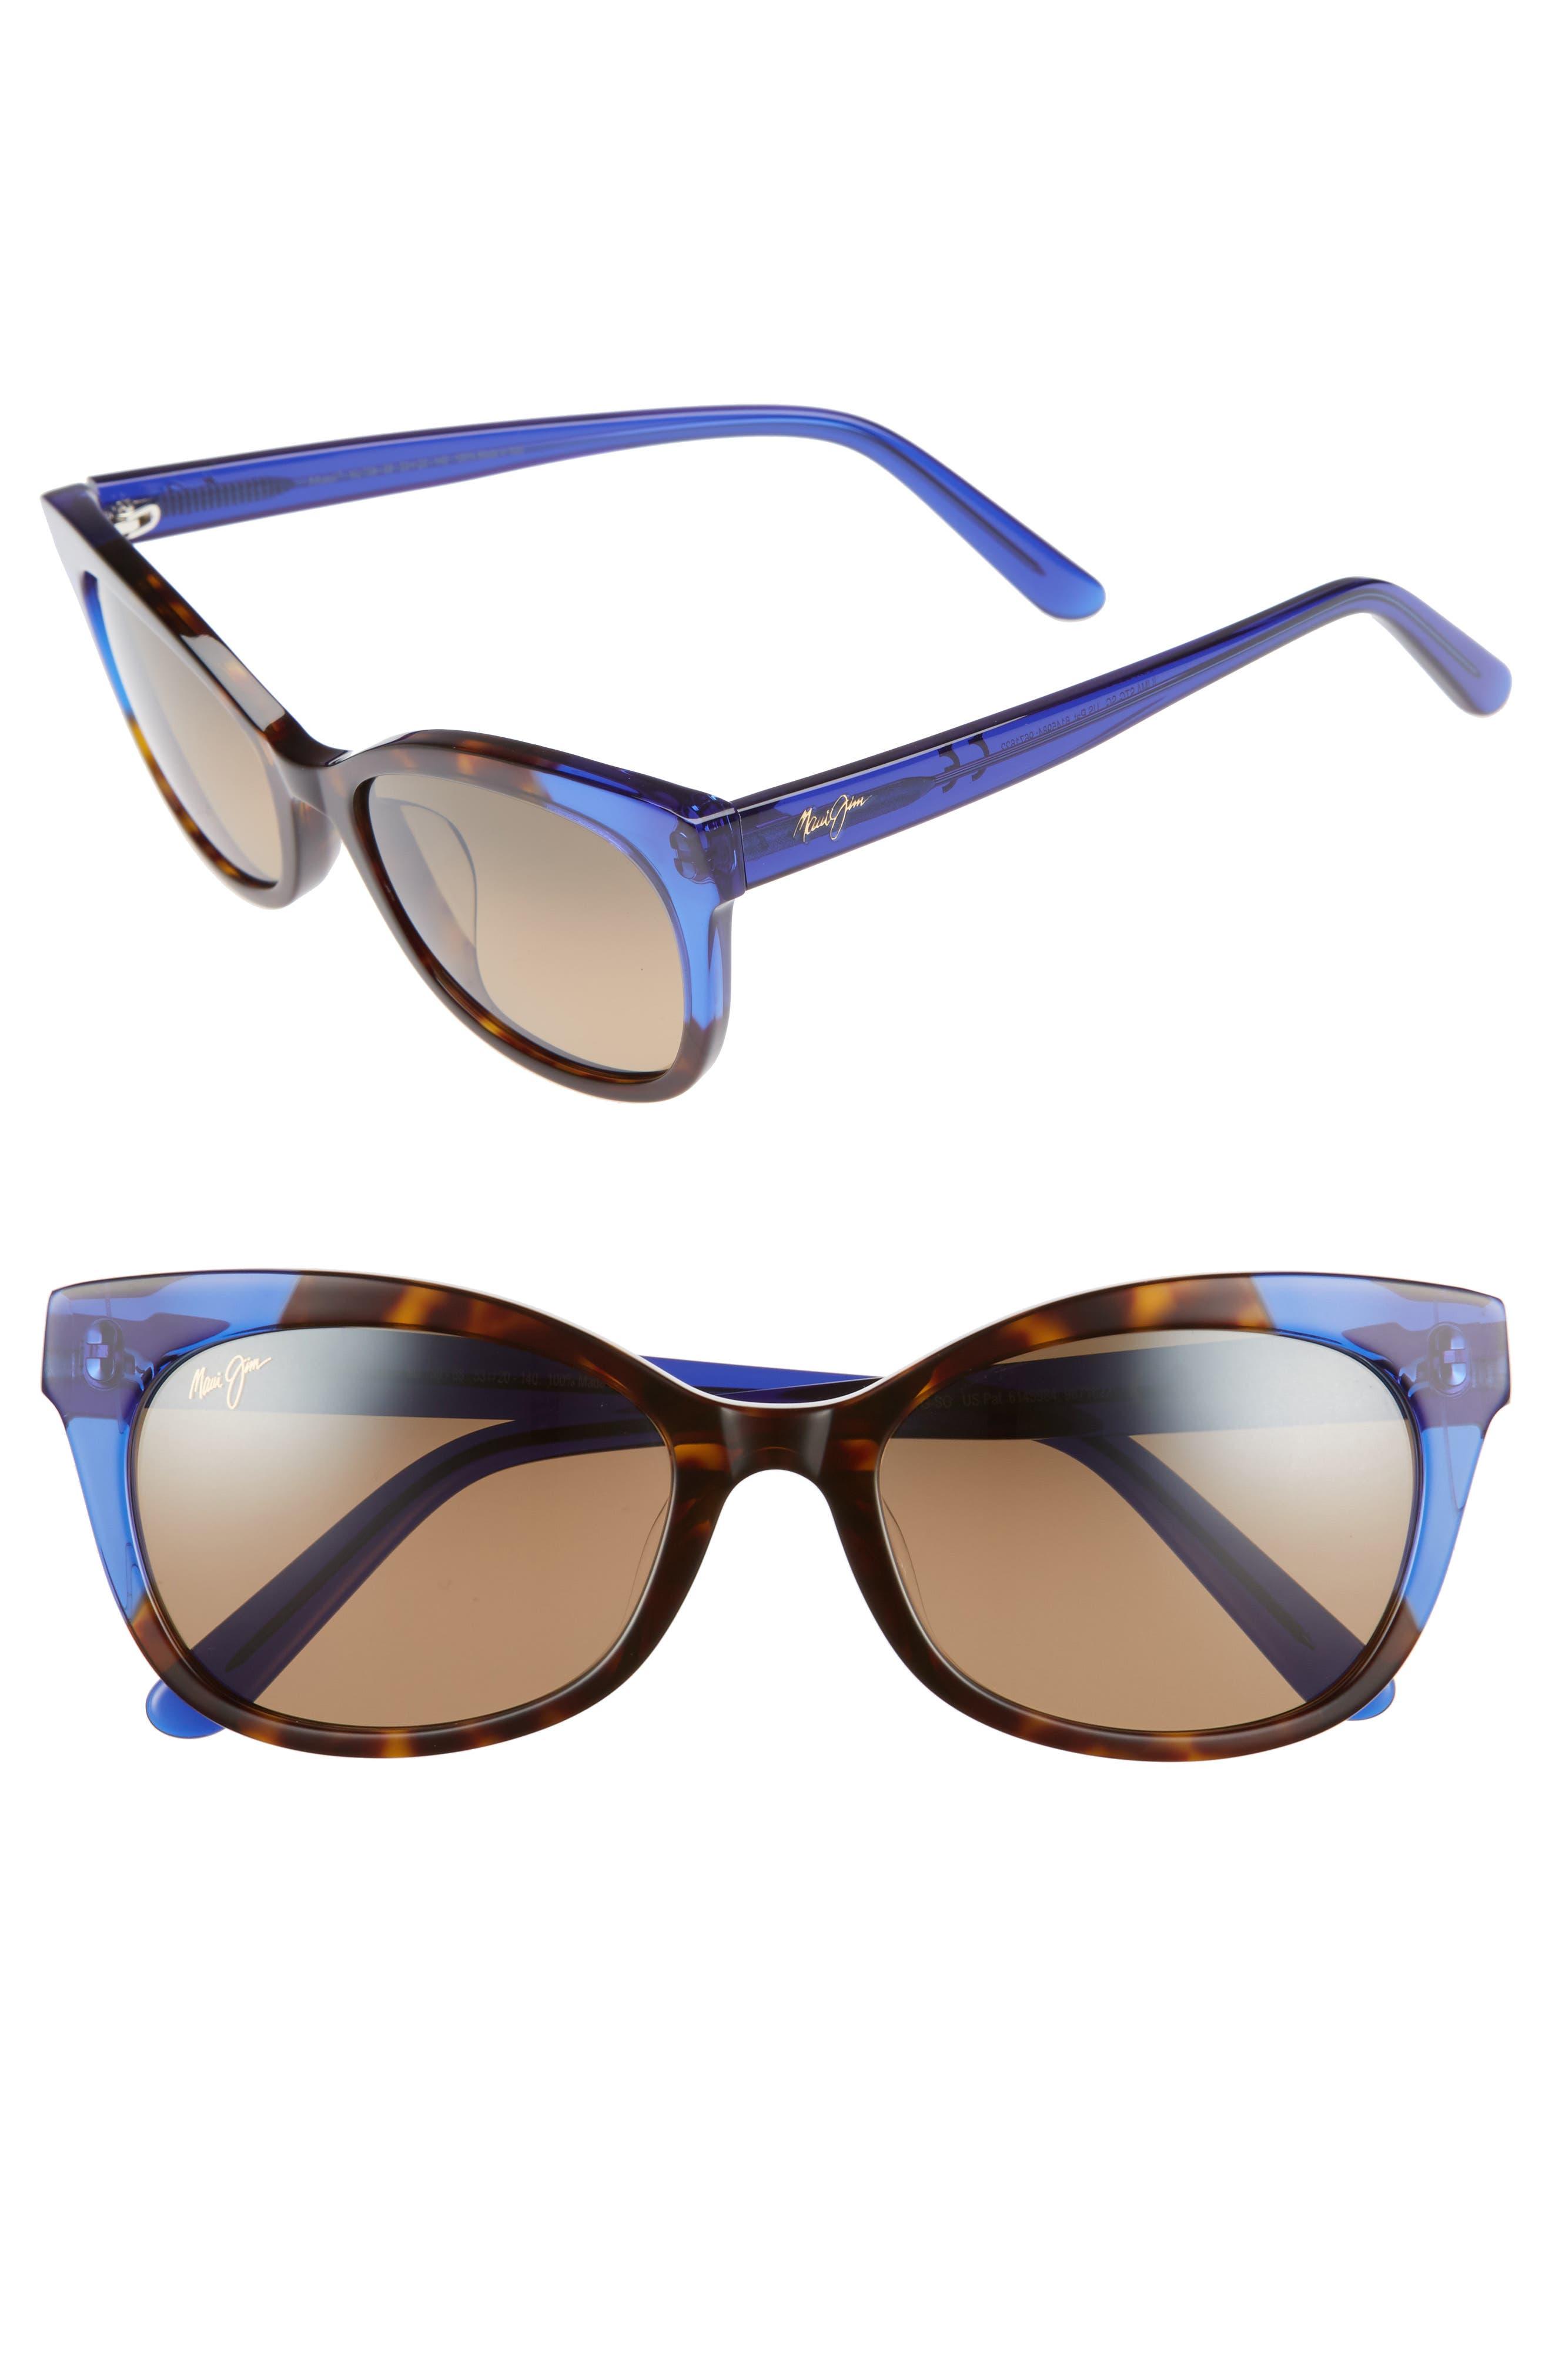 Maui Jim Ilima 5m Polarizedplus2 Cat Eye Sunglasses - Dark Tortoise/ Electric Blue